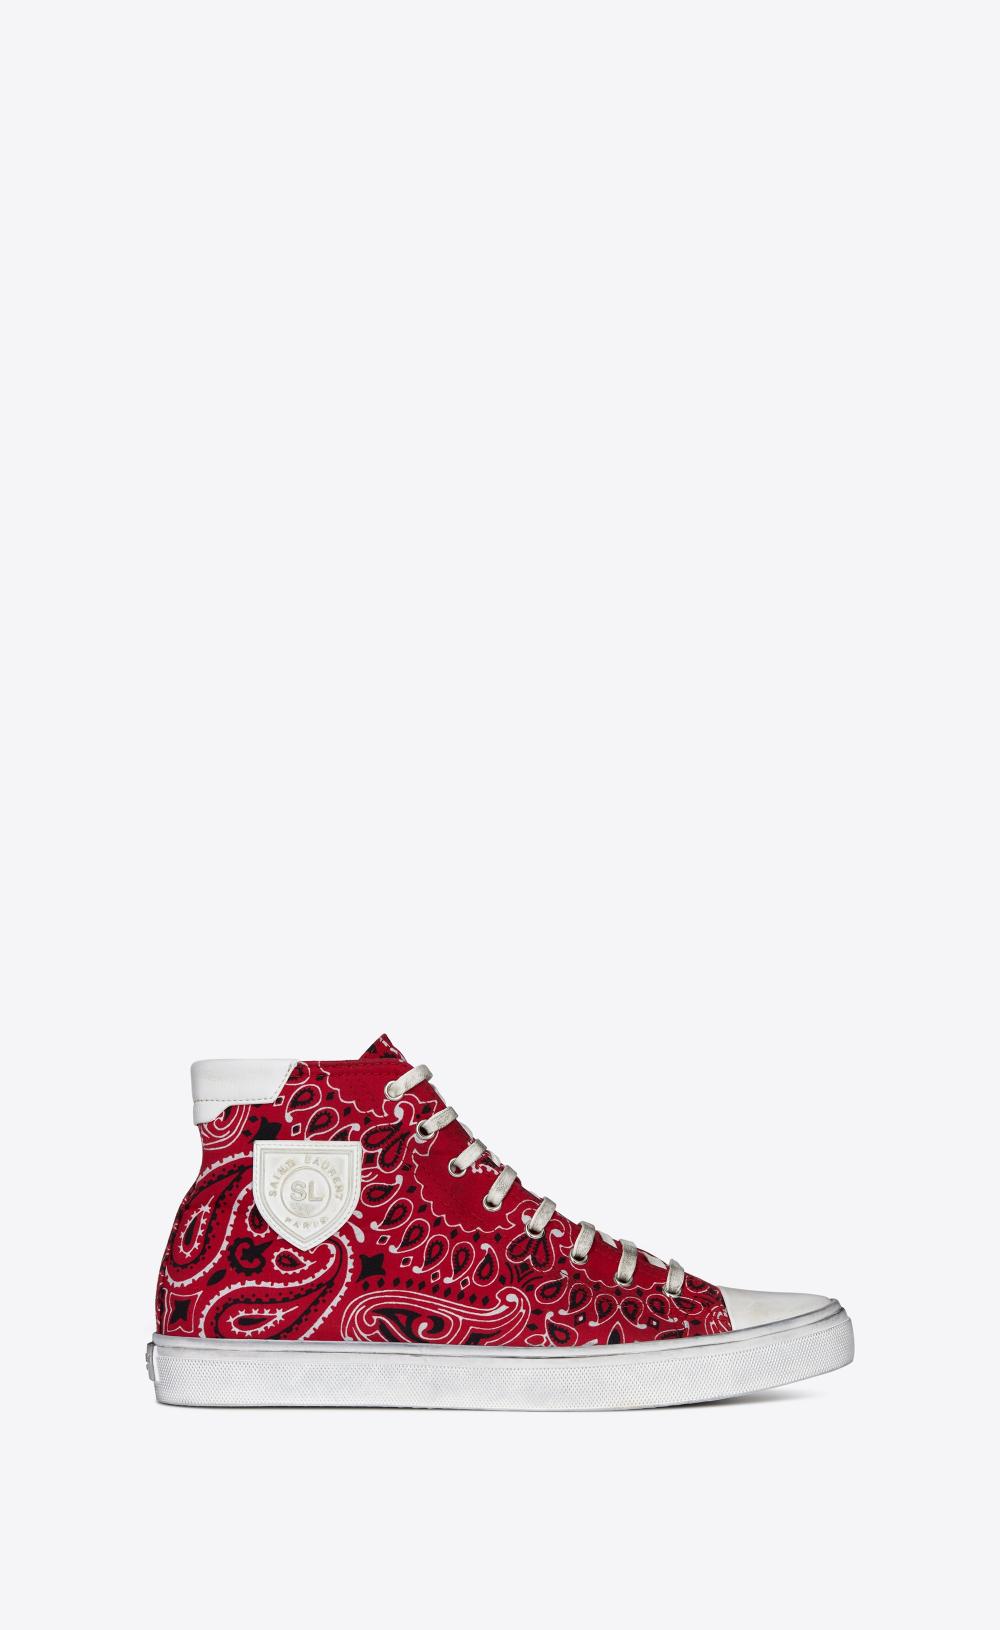 Saint Laurent Bedford Sneakers In